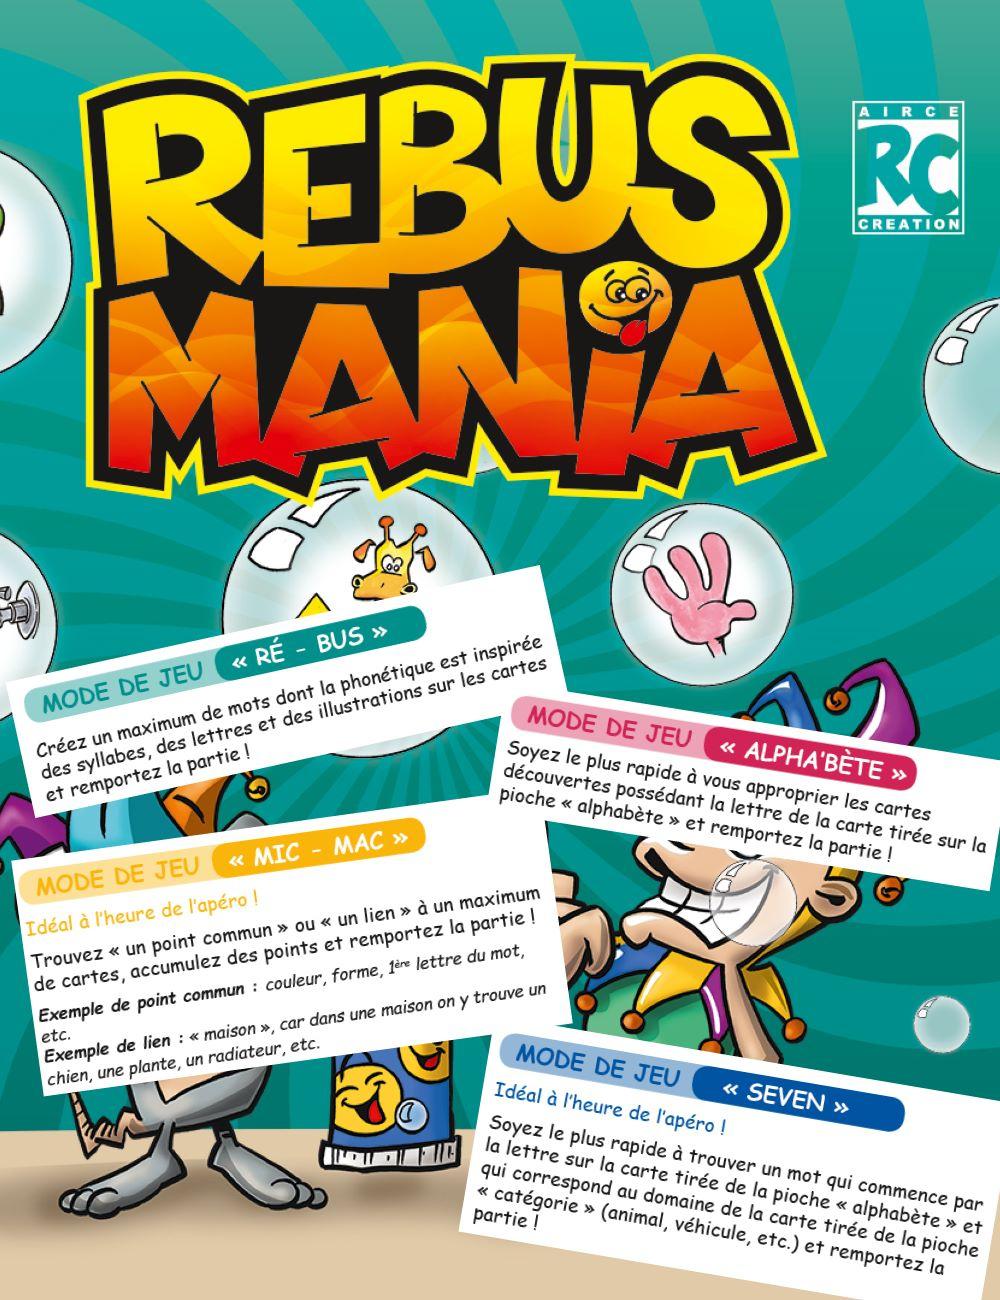 Règles Du Jeu Rebus Mania - Aircé.ch dedans Jeux Rebus